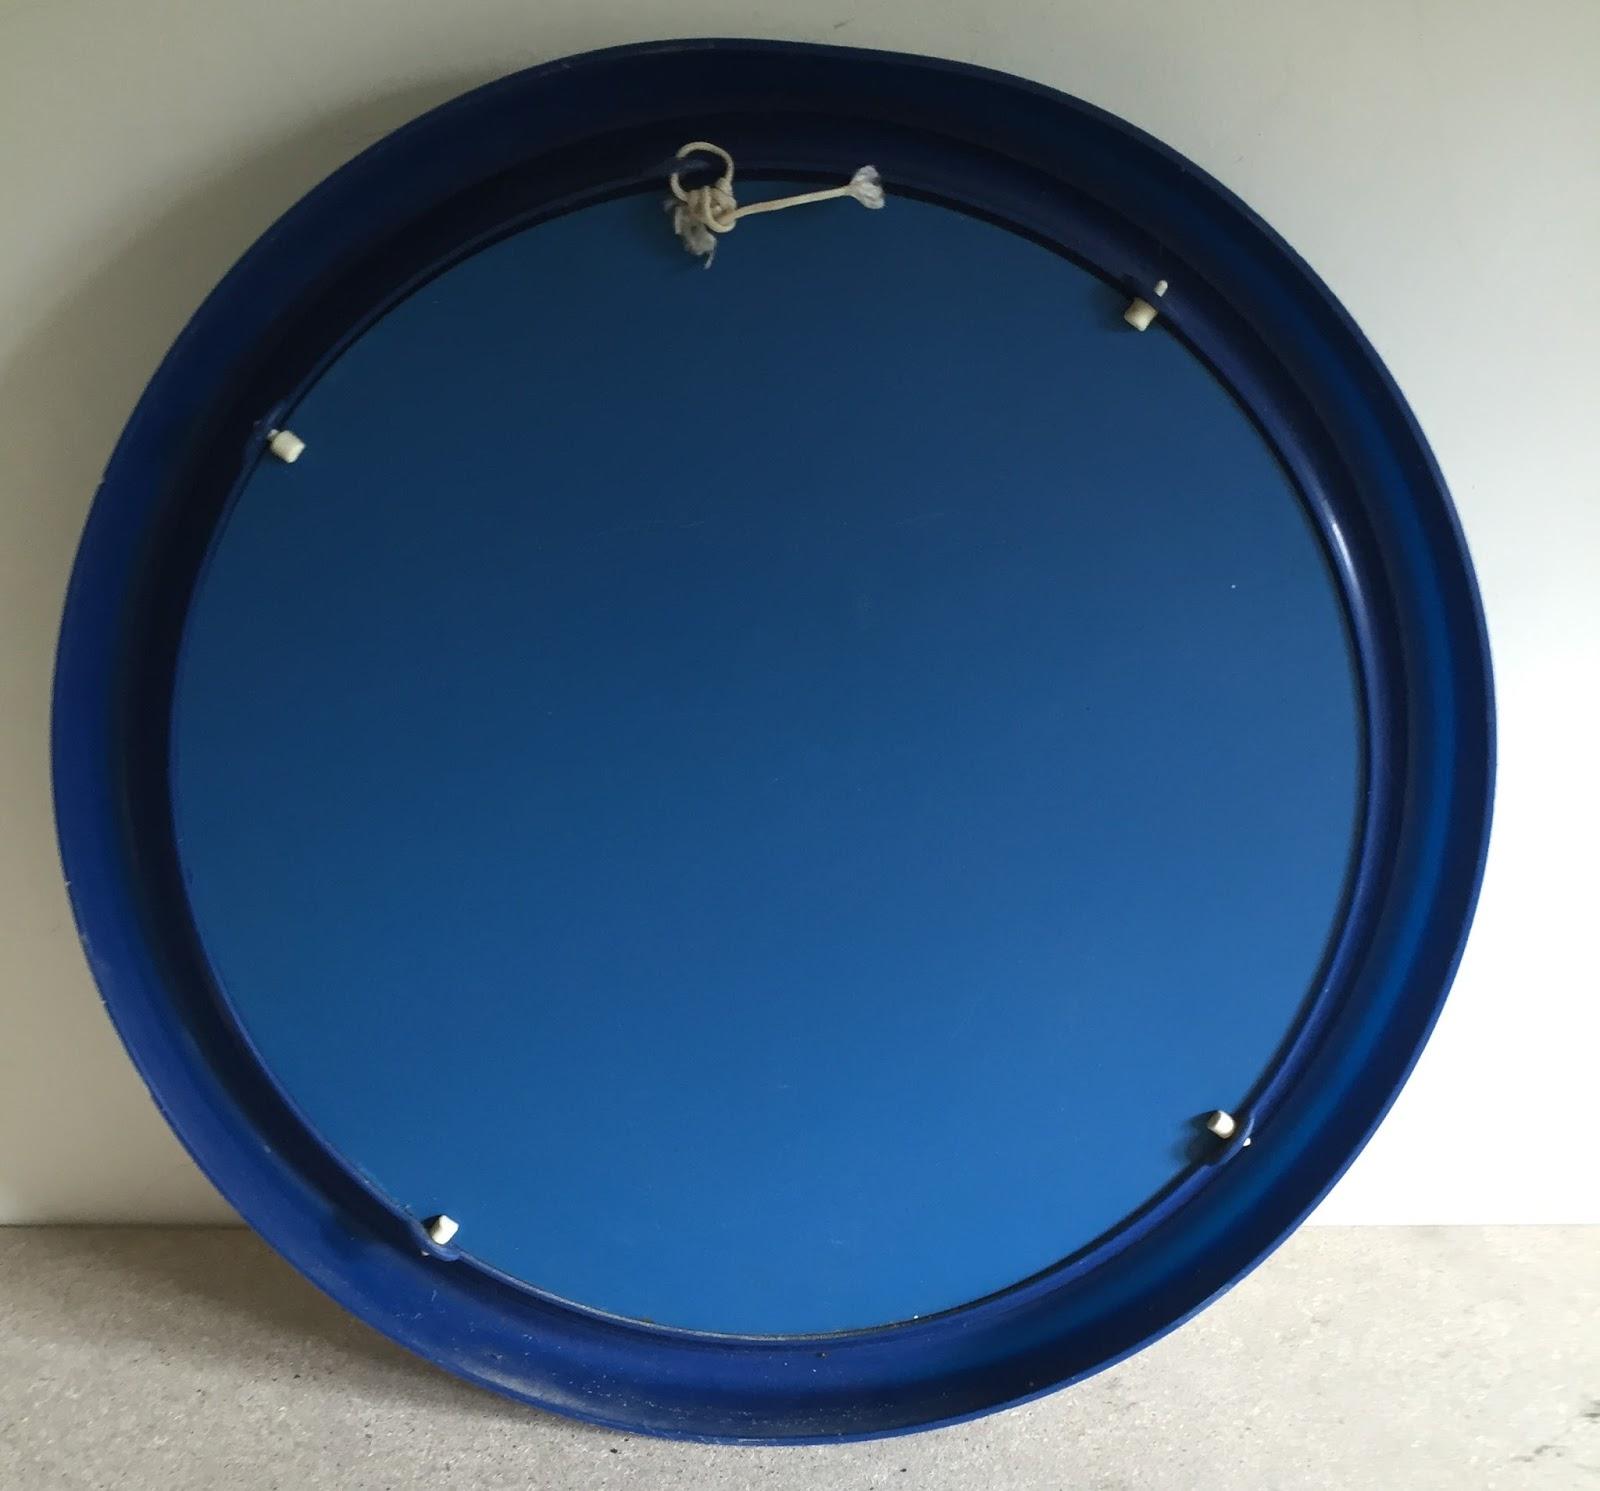 Espejo ba o marco pl stico azul vintage jacoboansin for Espejos de bano vintage